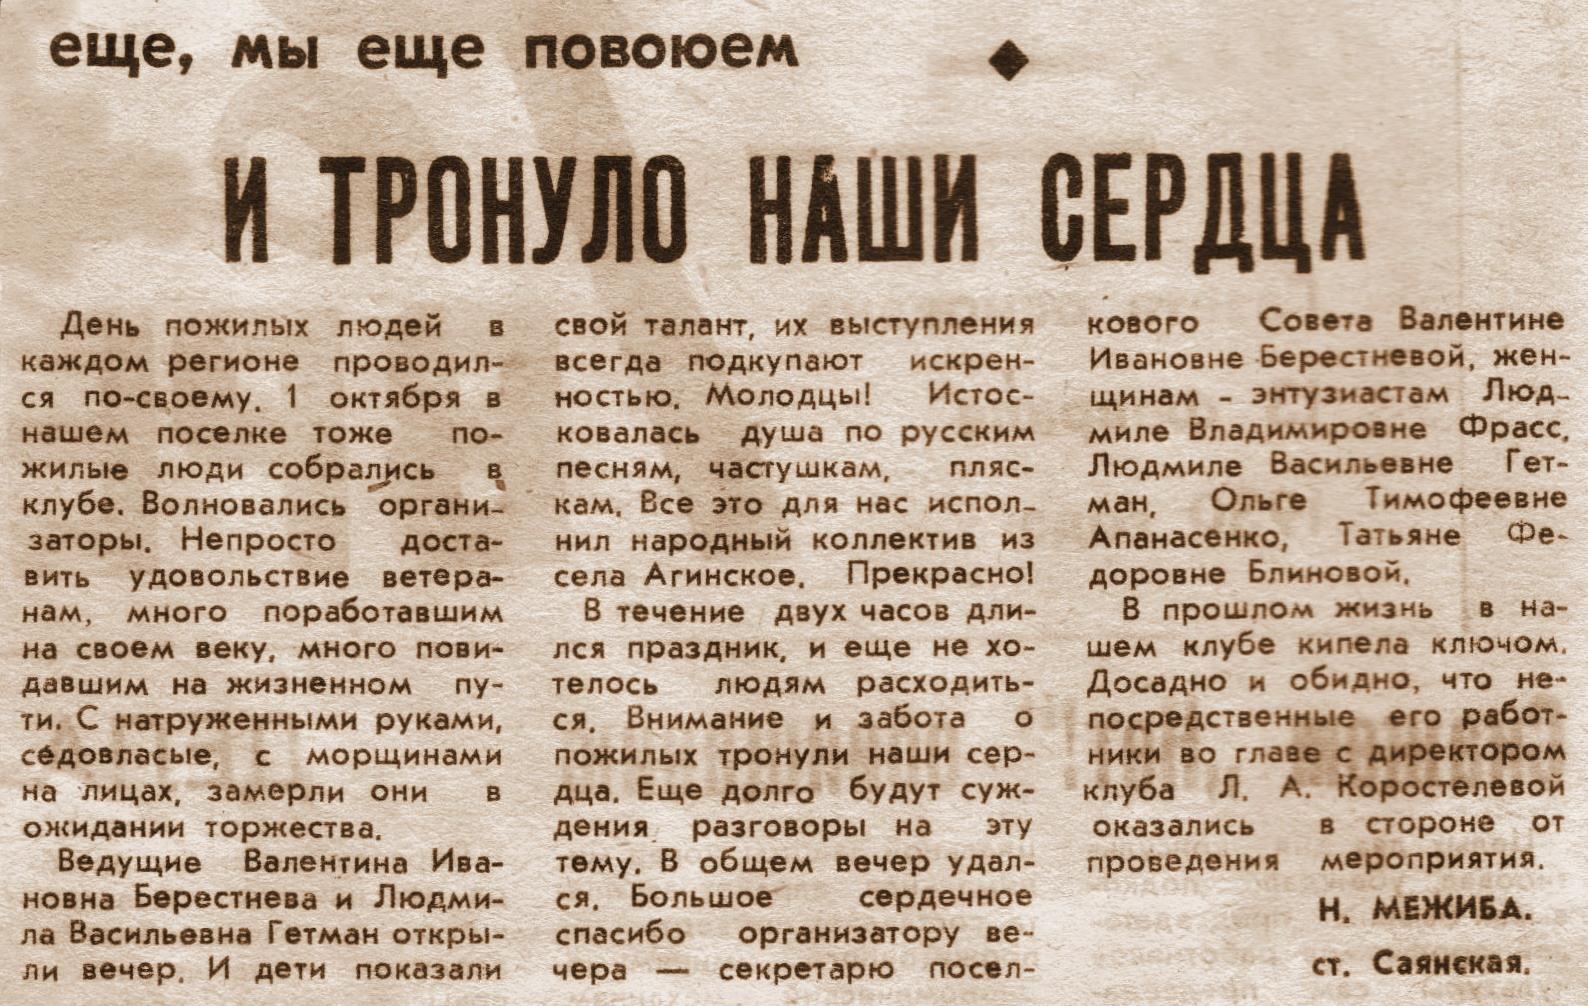 Статья из газеты за 1992 год